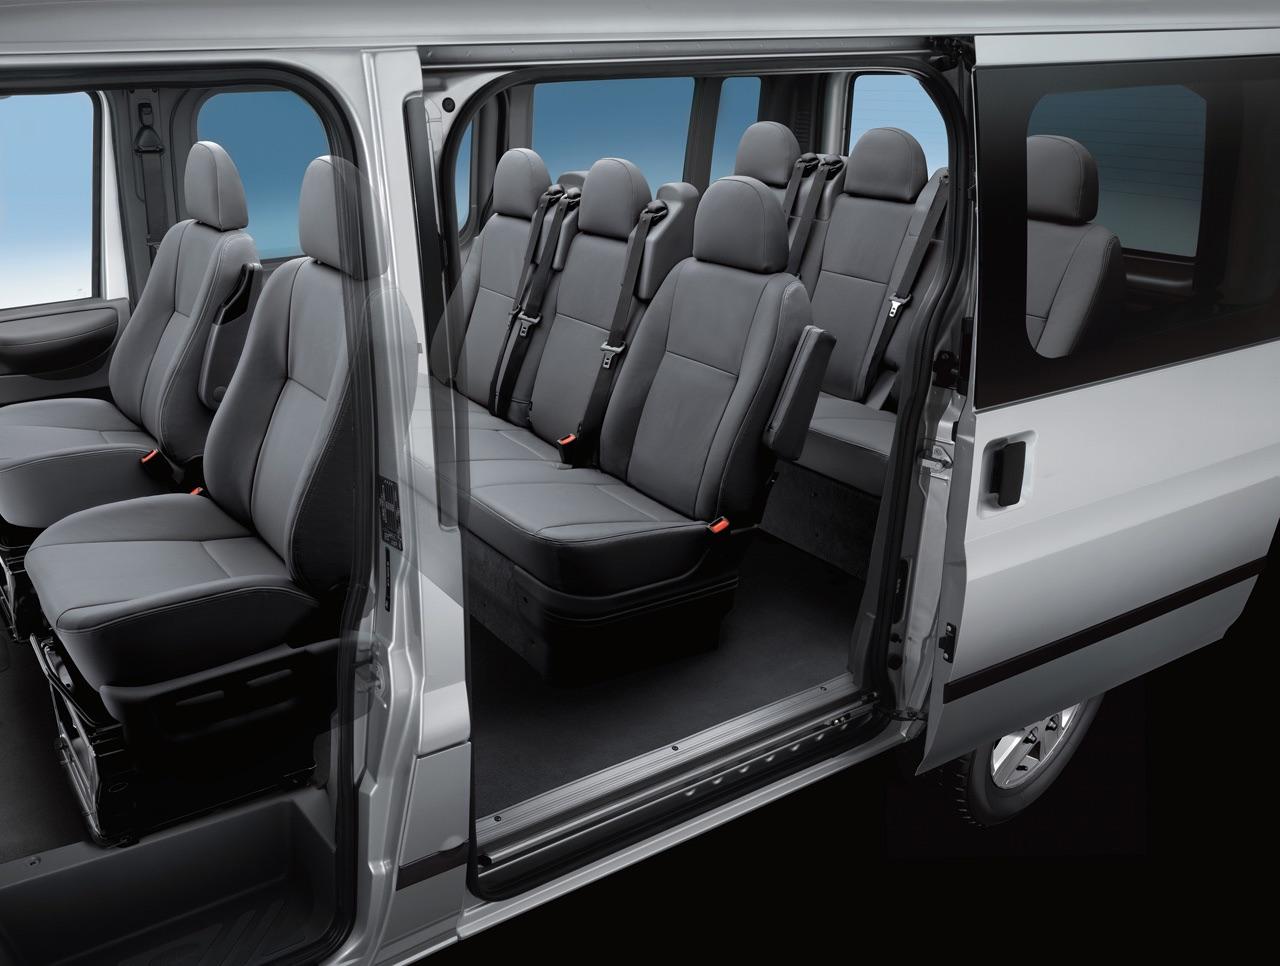 Ford+Transit+Sprinter+Class+Van+Interior+6.jpeg